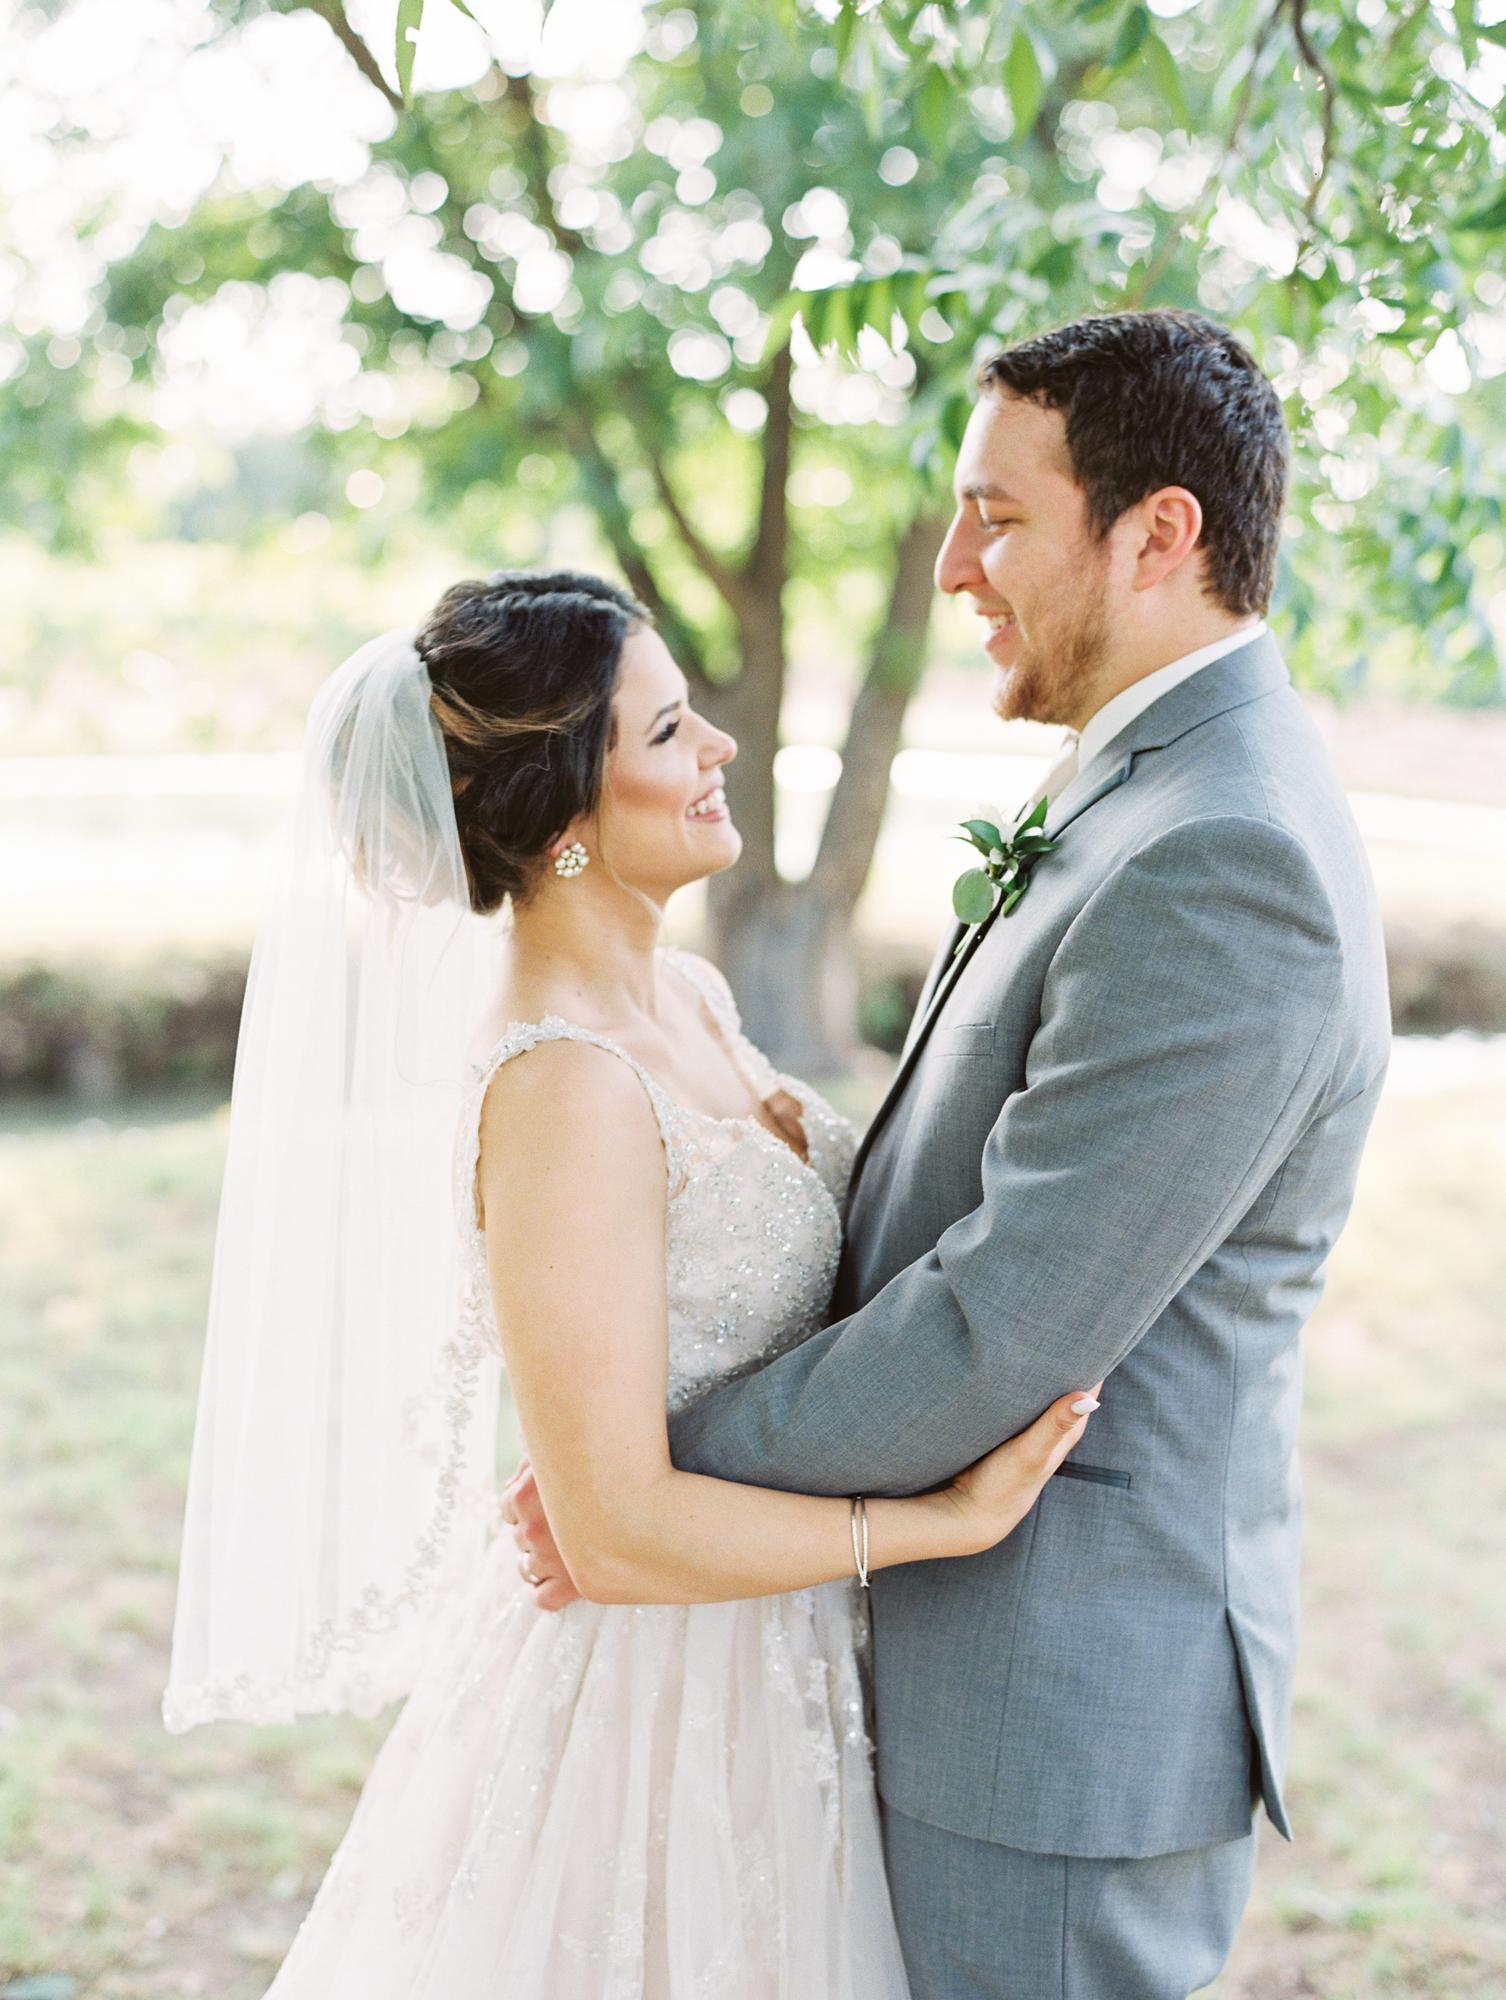 Elegant Spring Vineyard Wedding | Film Wedding Photographer | Austin Wedding Photographer | Bride and Groom Portrait | Britni Dean Photography // britnidean.com